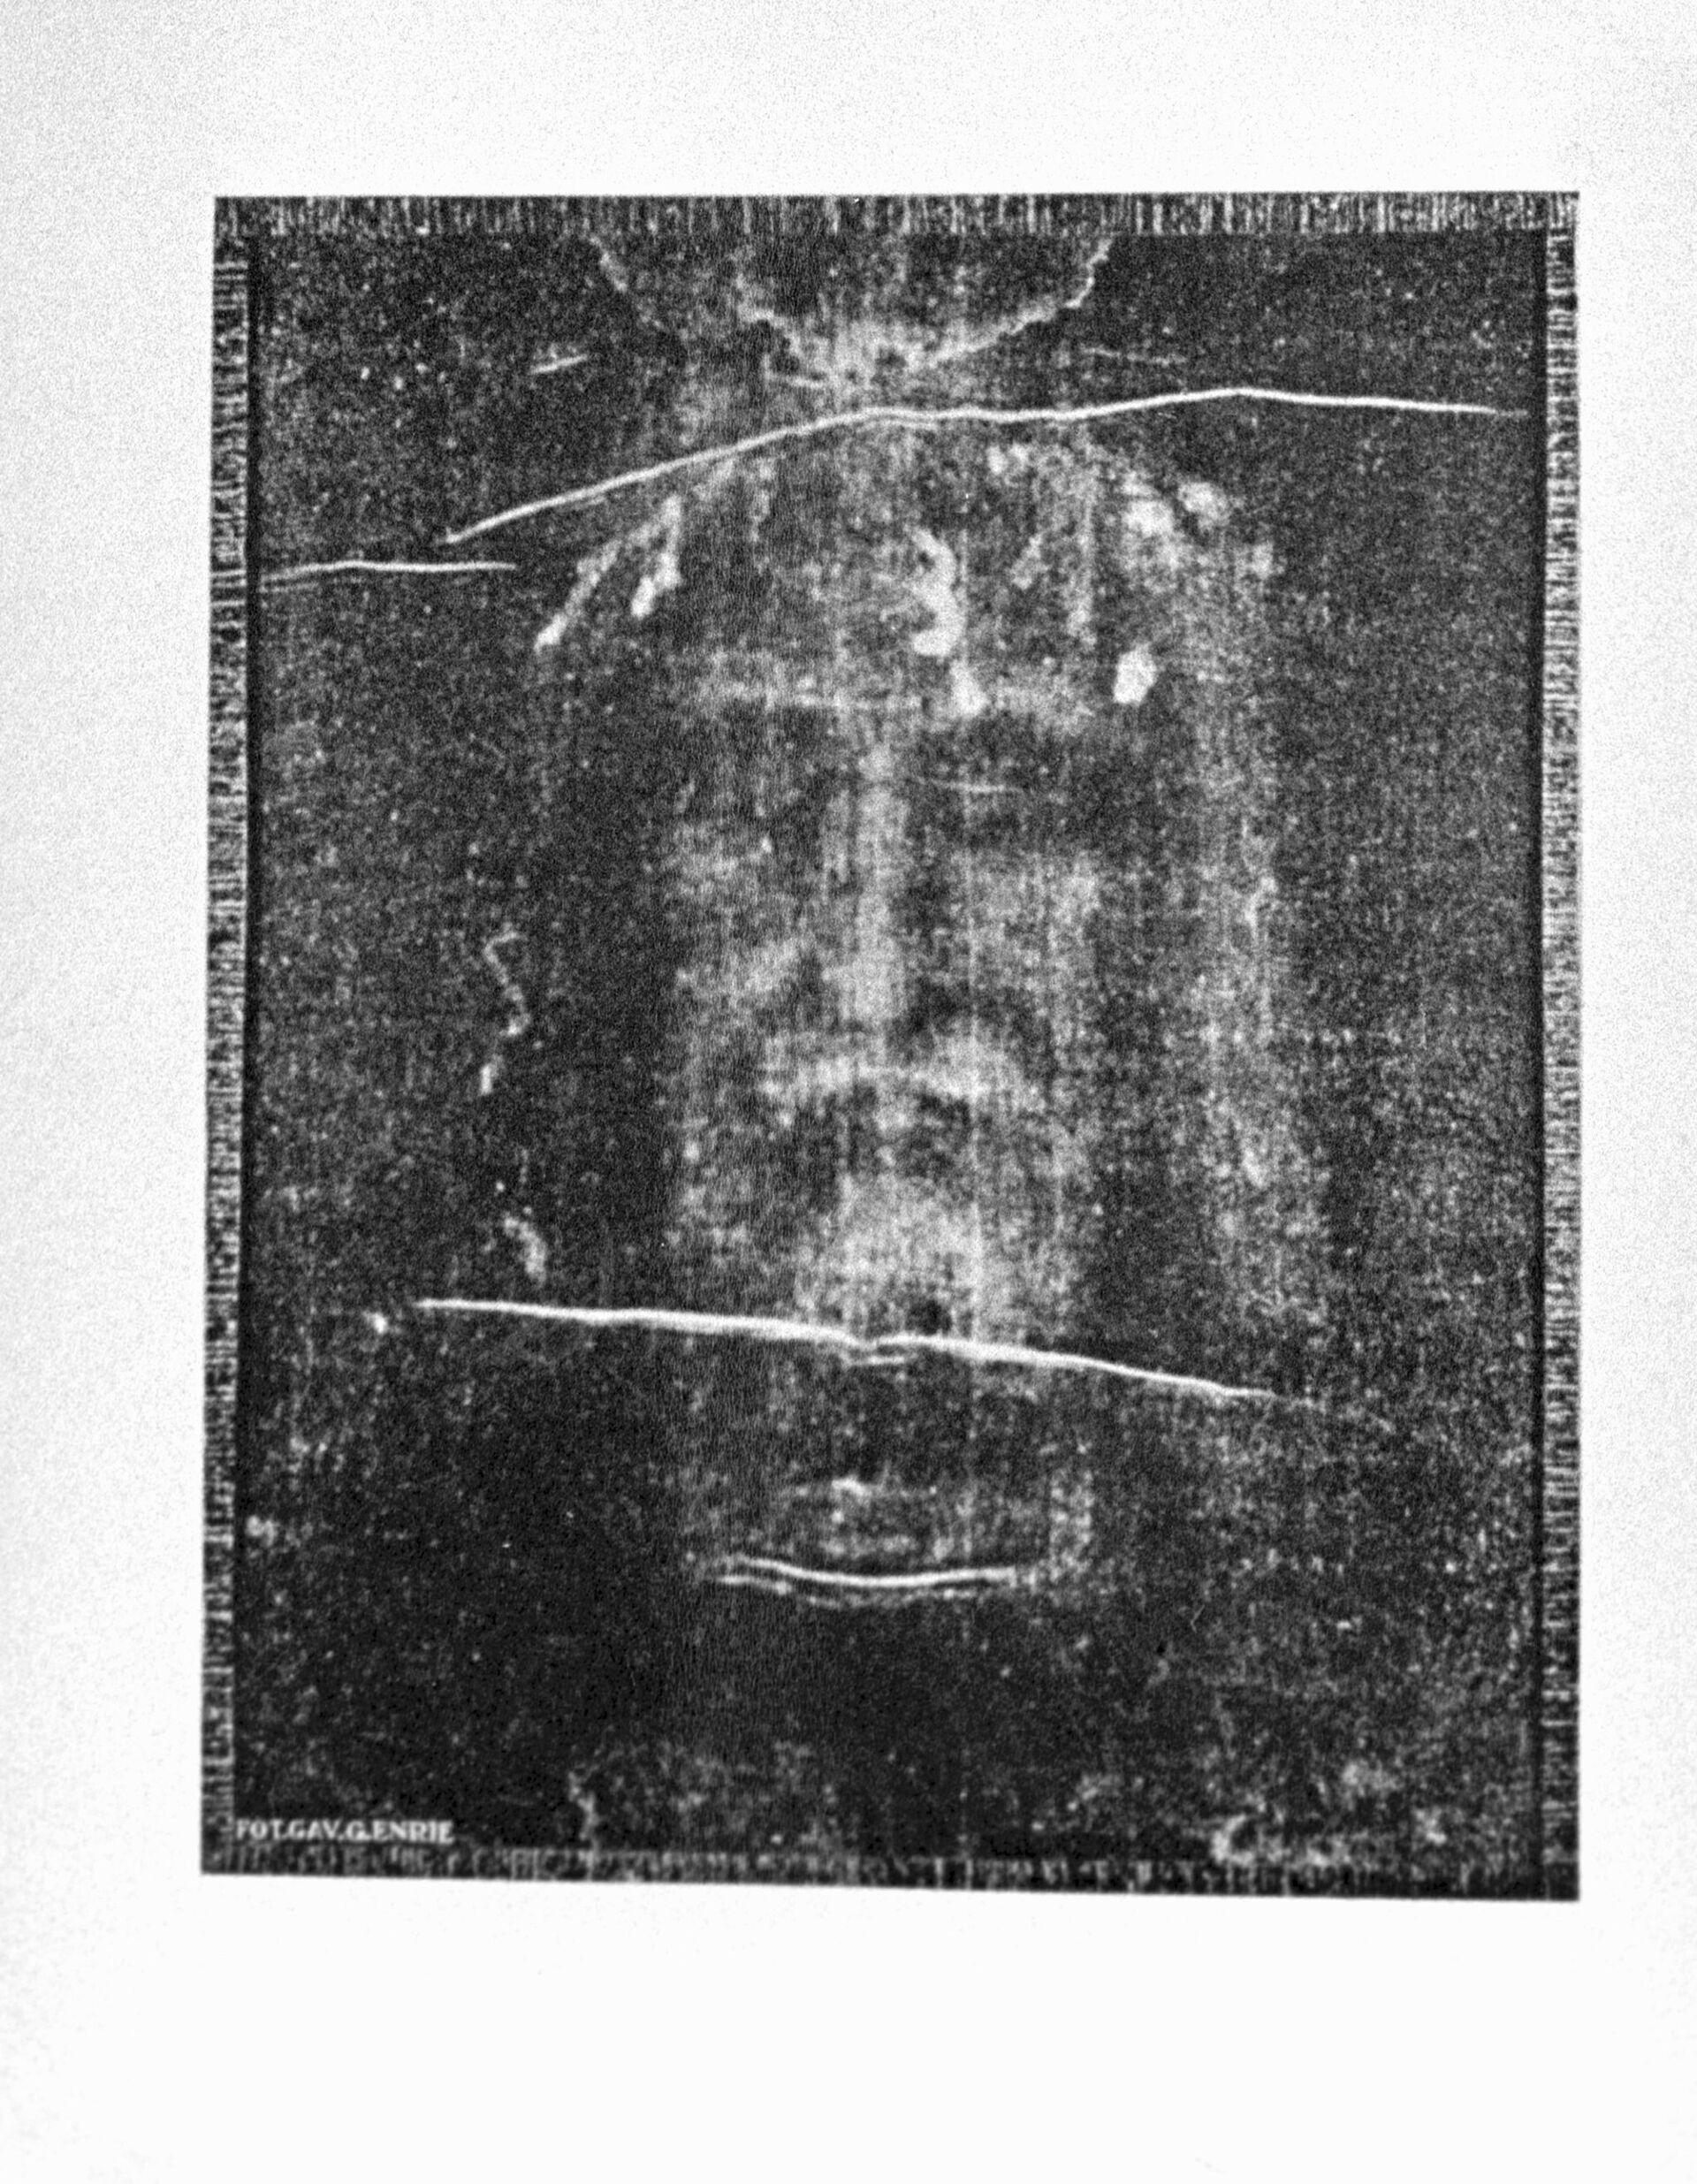 Плащаница Иисуса Христа. Репродукция. - Sputnik Абхазия, 1920, 12.10.2021